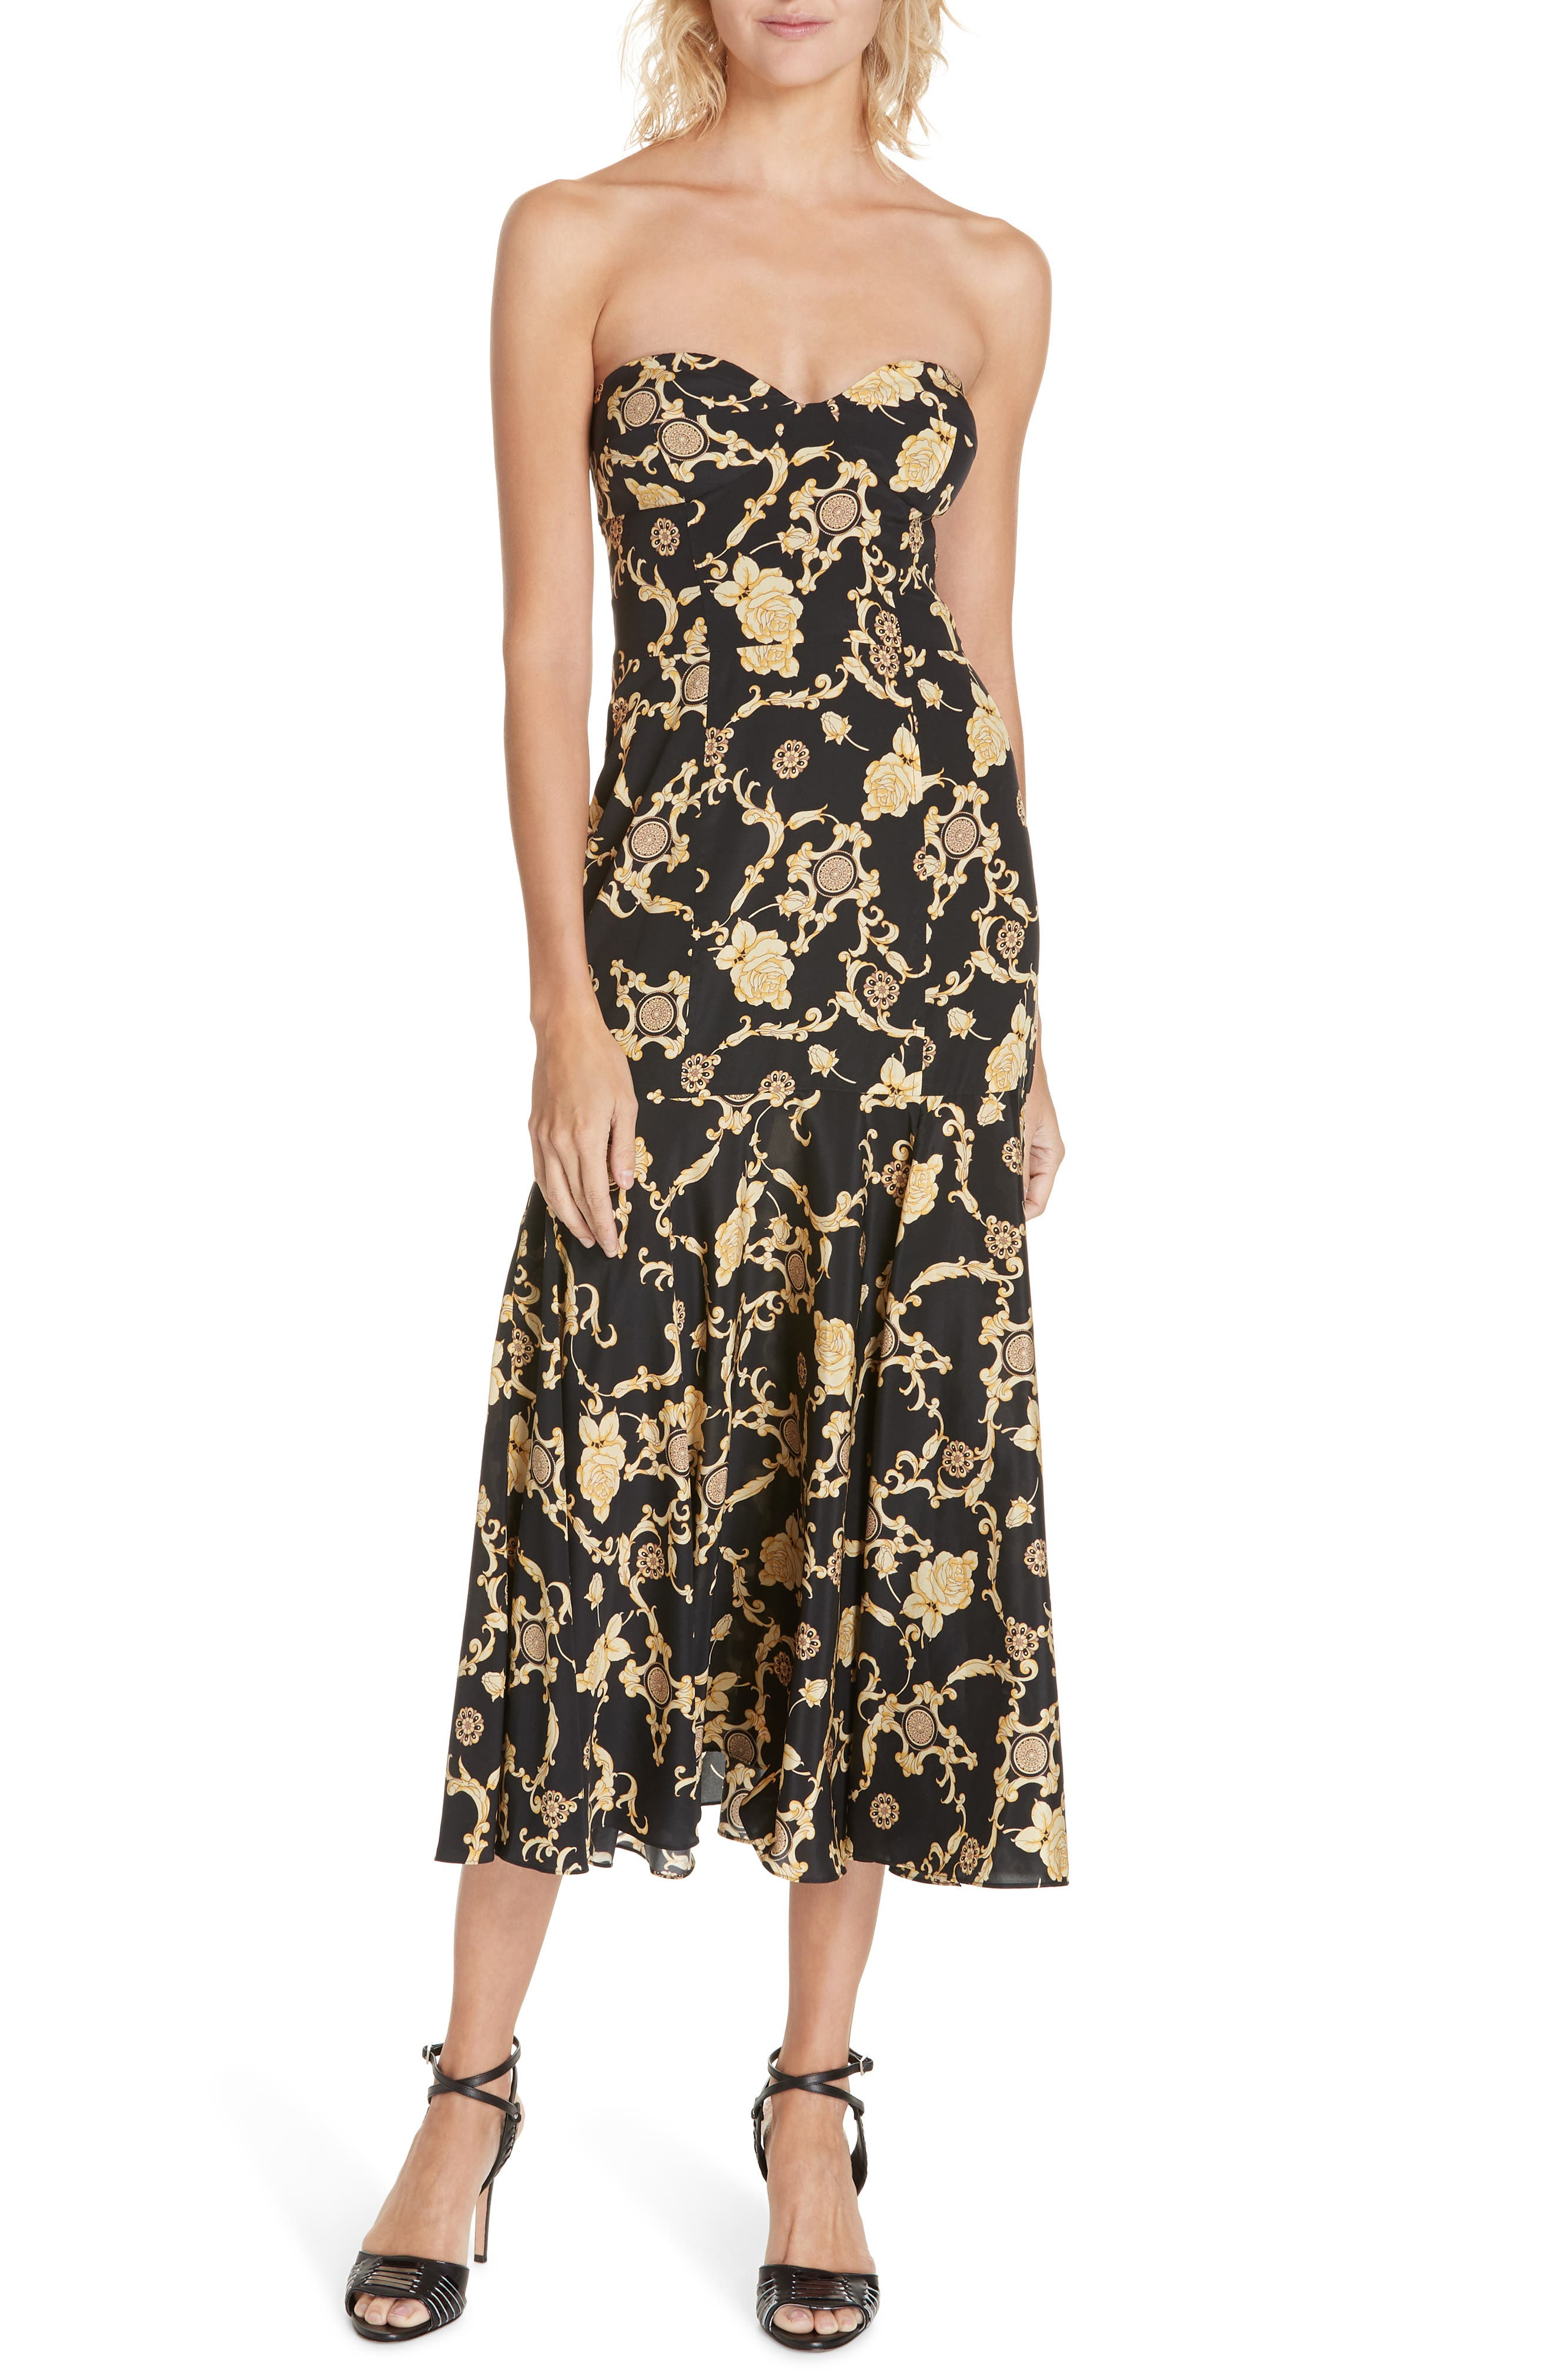 Annika Floral Print Strapless Stretch Silk Dress,                             Main thumbnail 1, color,                             BLACK/ GOLD